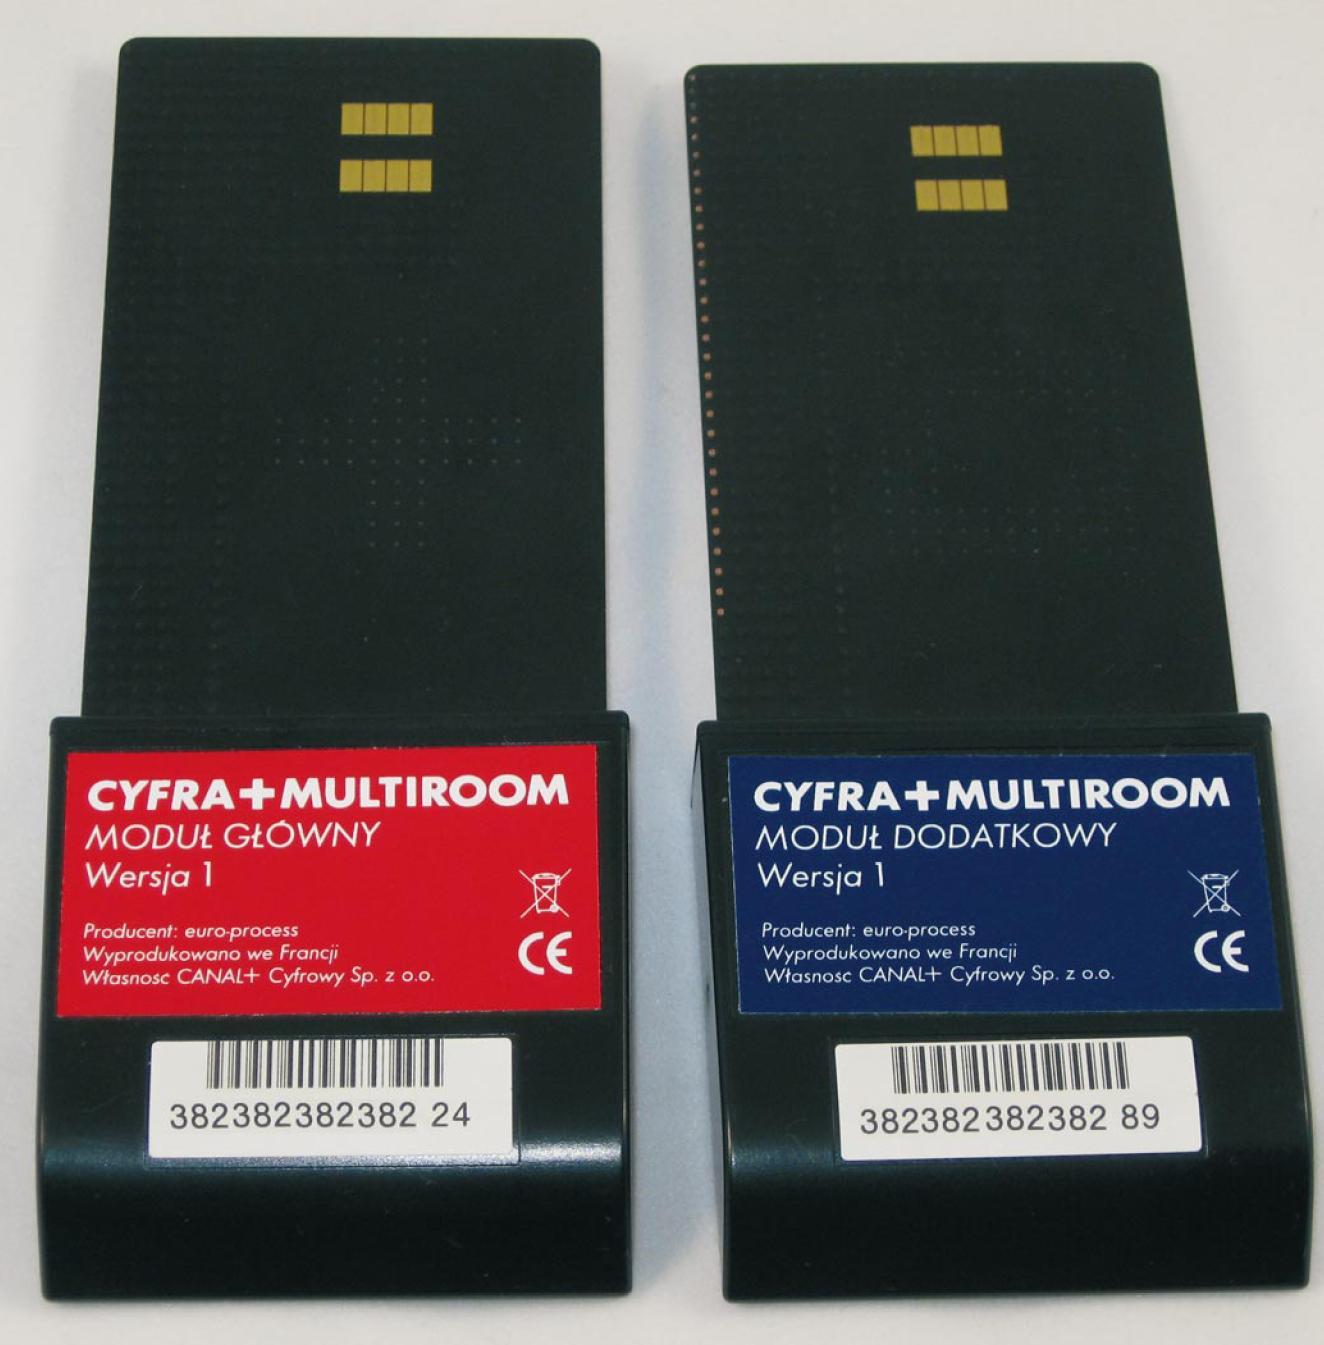 CYFRA+MULTIROOM.jpg